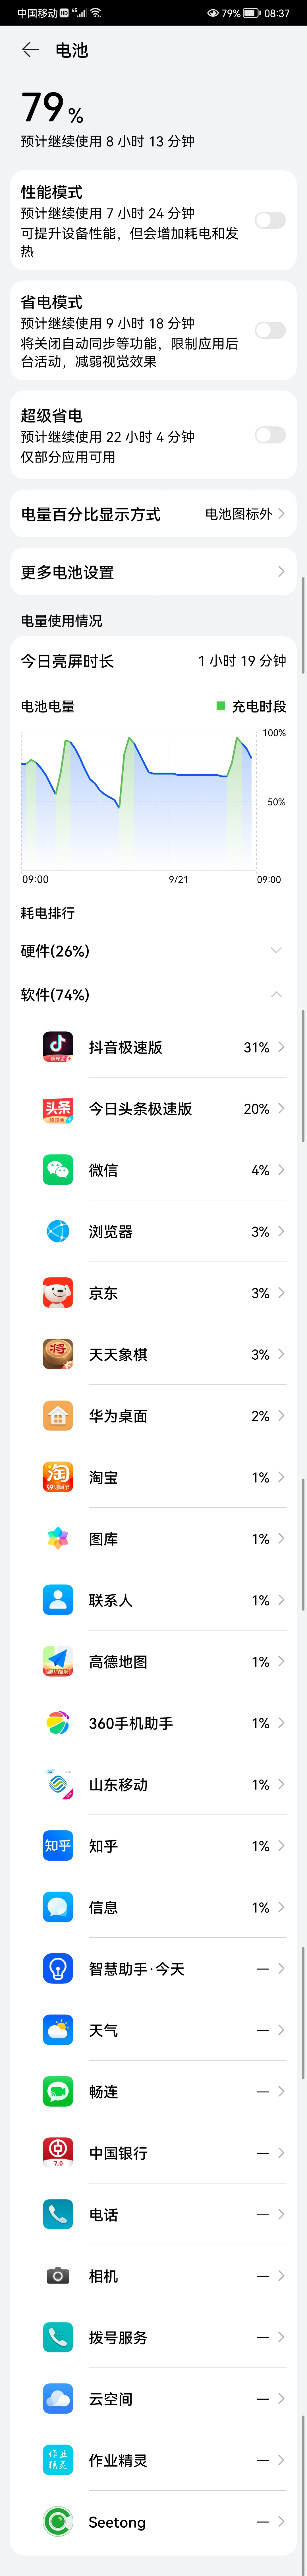 Screenshot_20210921_083658_com.huawei.systemmanager.jpg